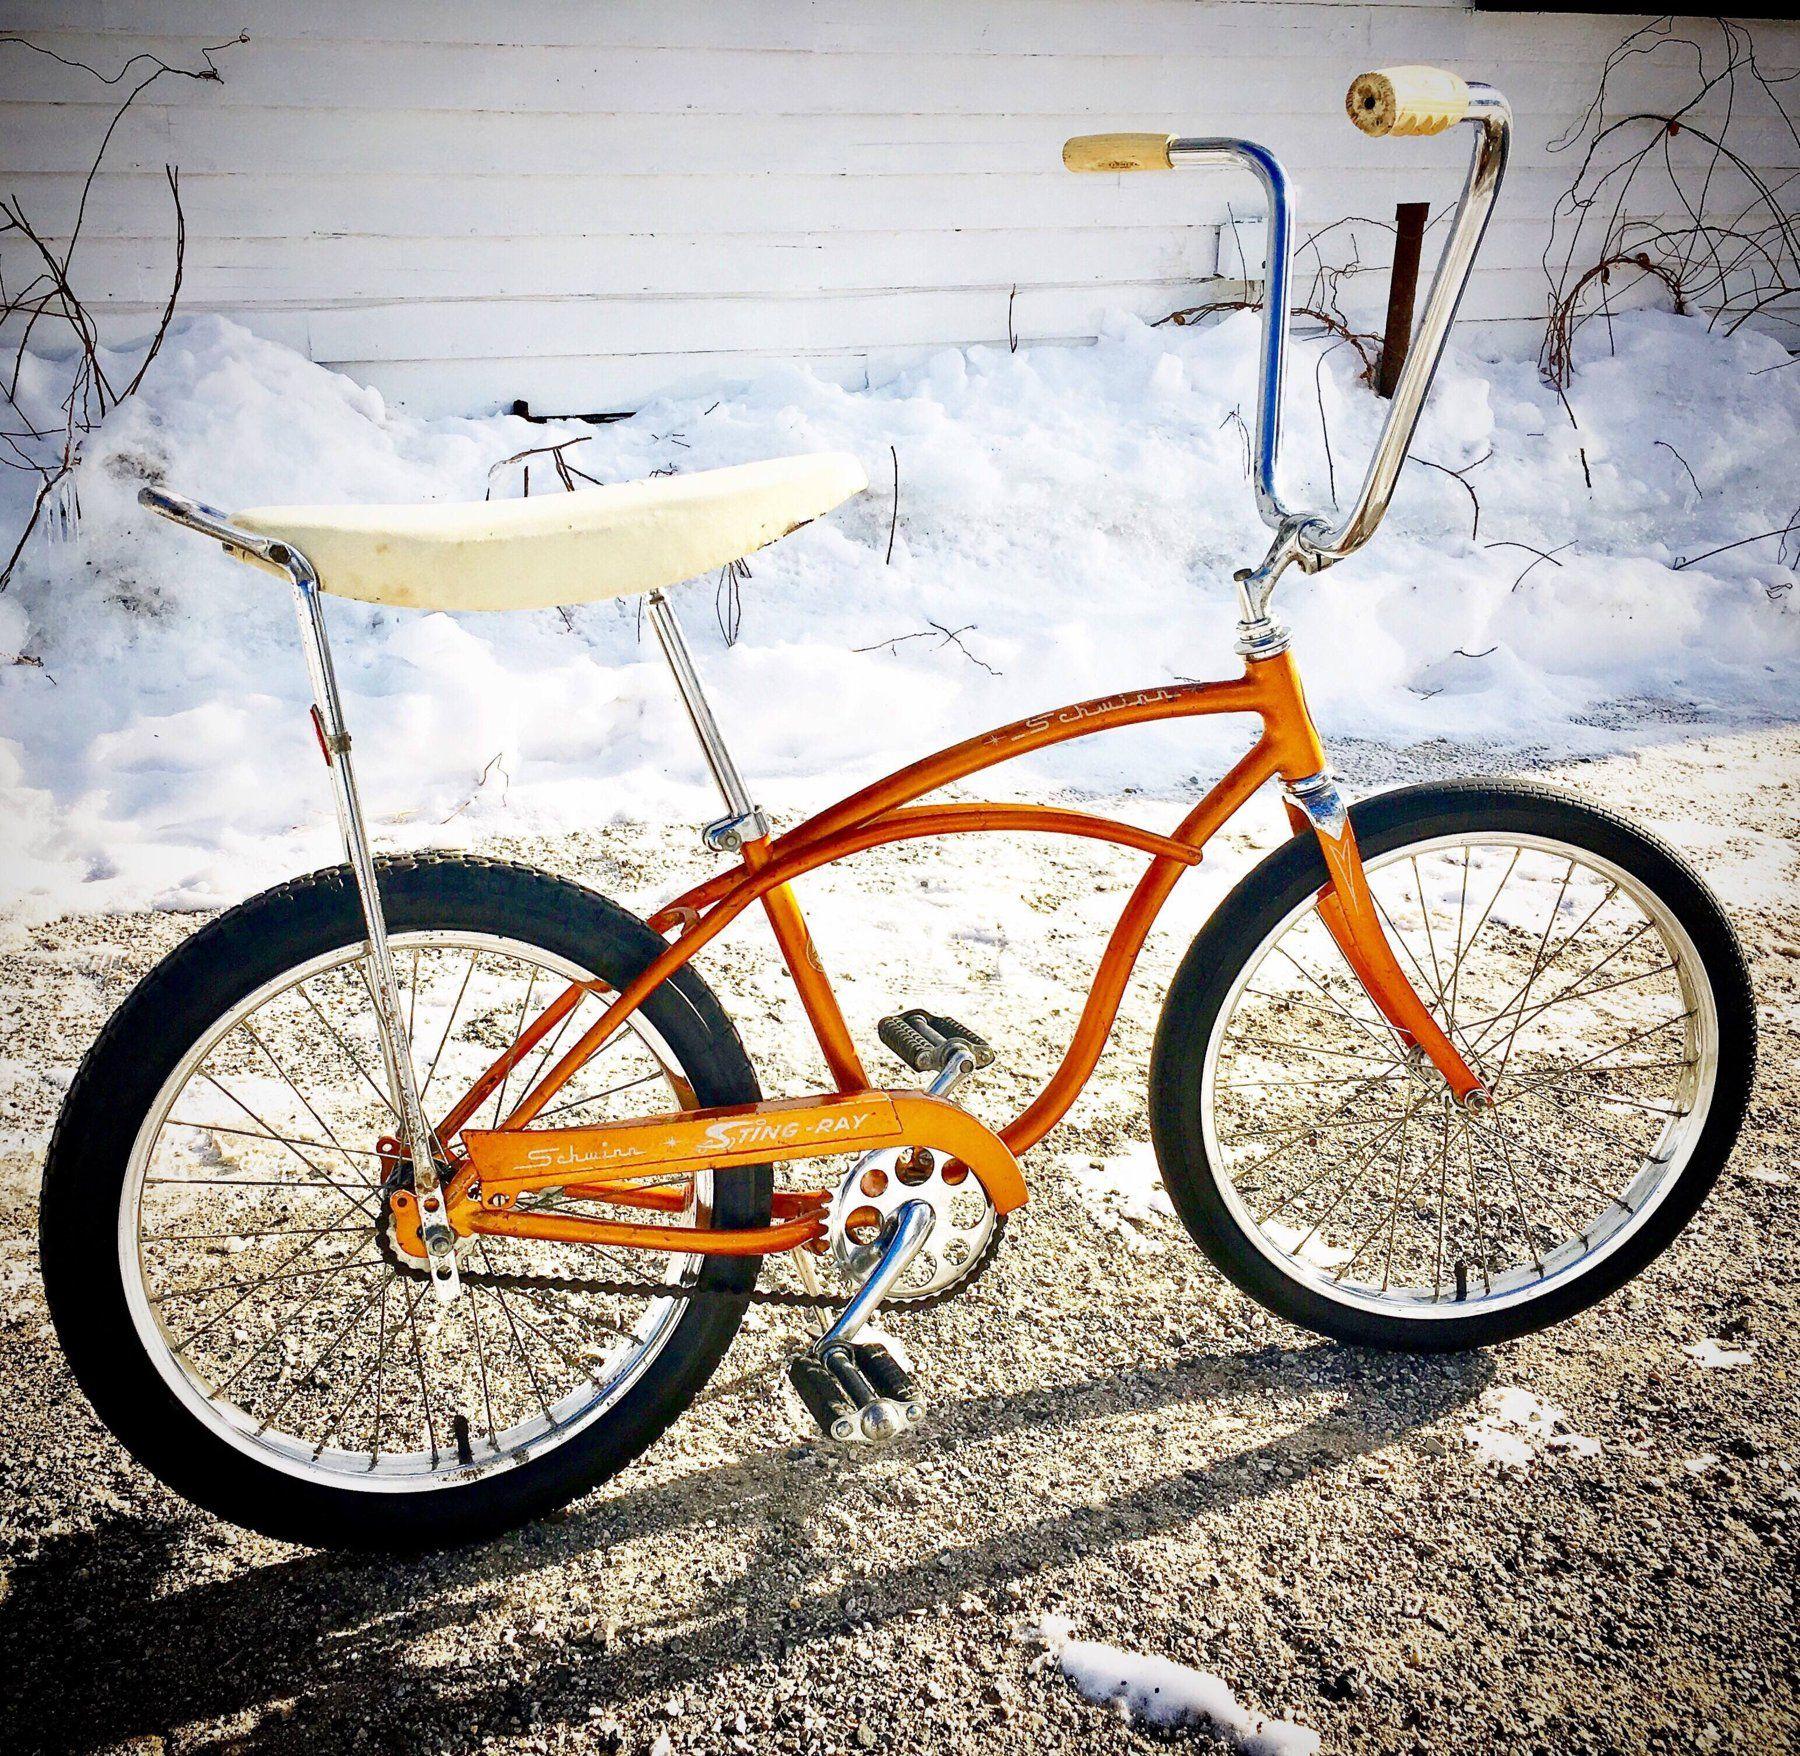 OldSchool BMX Bike STAR GRIPS Vintage Schwinn Stingray Cruiser Bicycle MTB Fixie